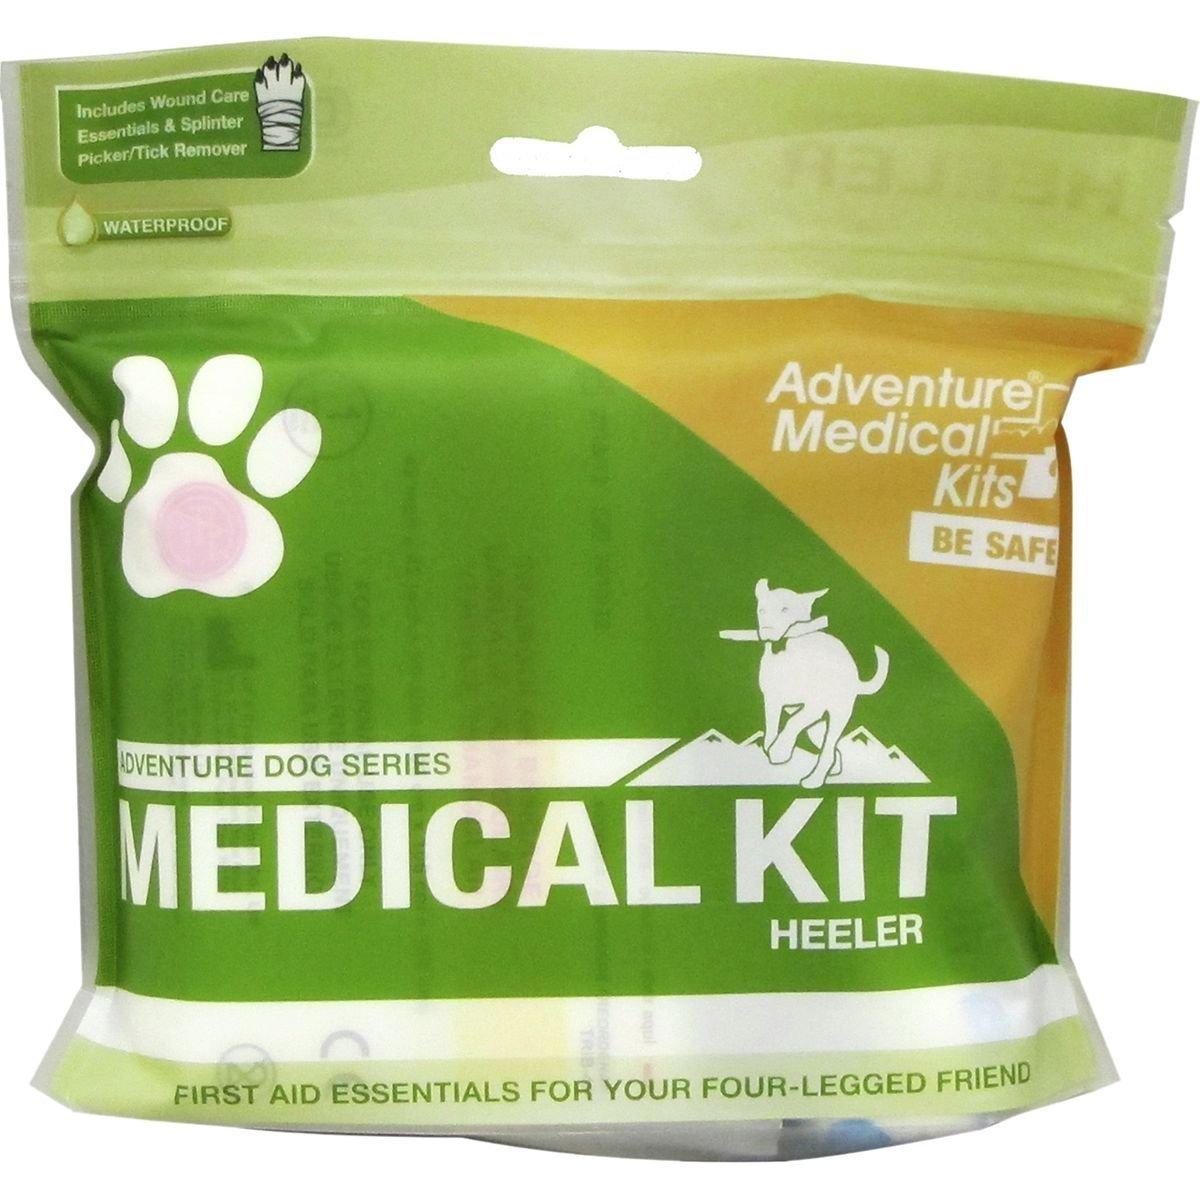 Adventure Medical Adventure Dog Series Medical Kit One Color, Workin' Dog Kit